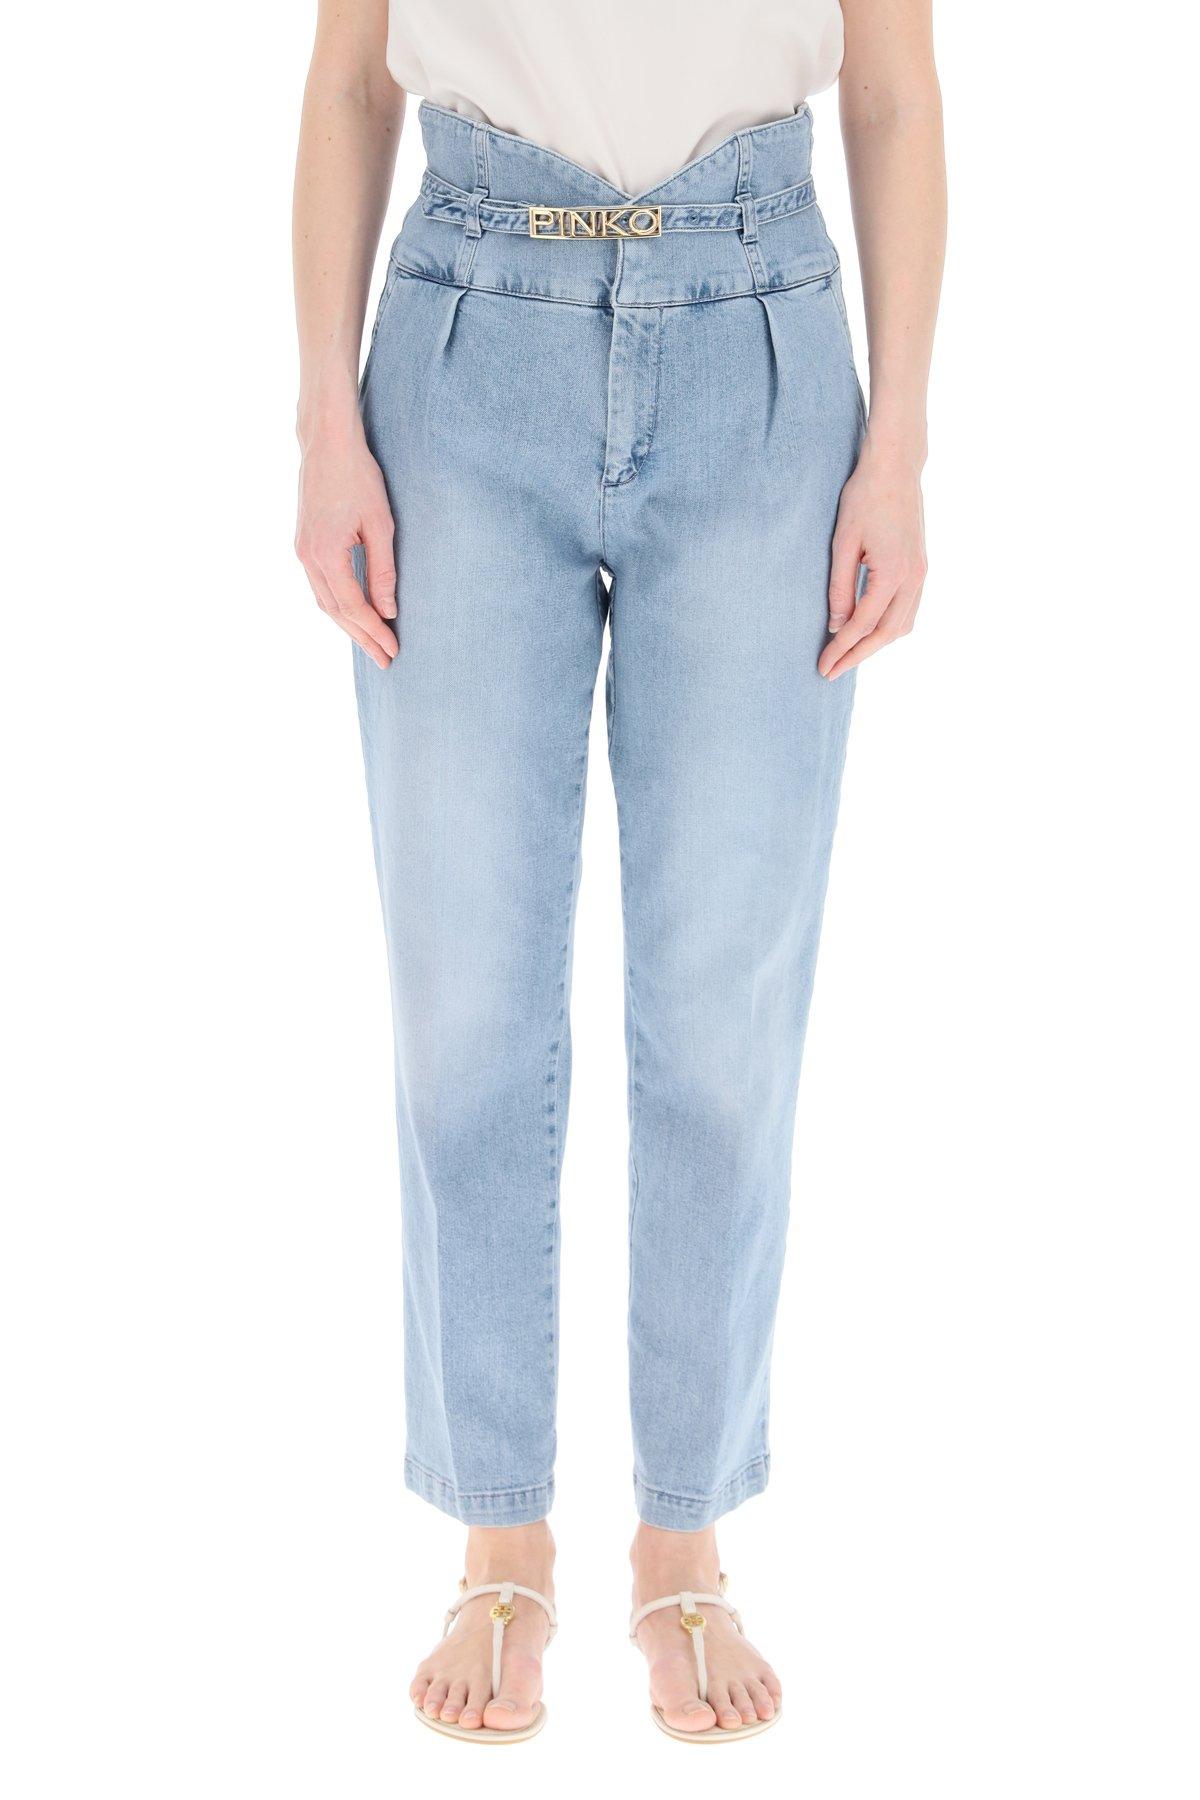 Pinko jeans ariel vita alta bustier